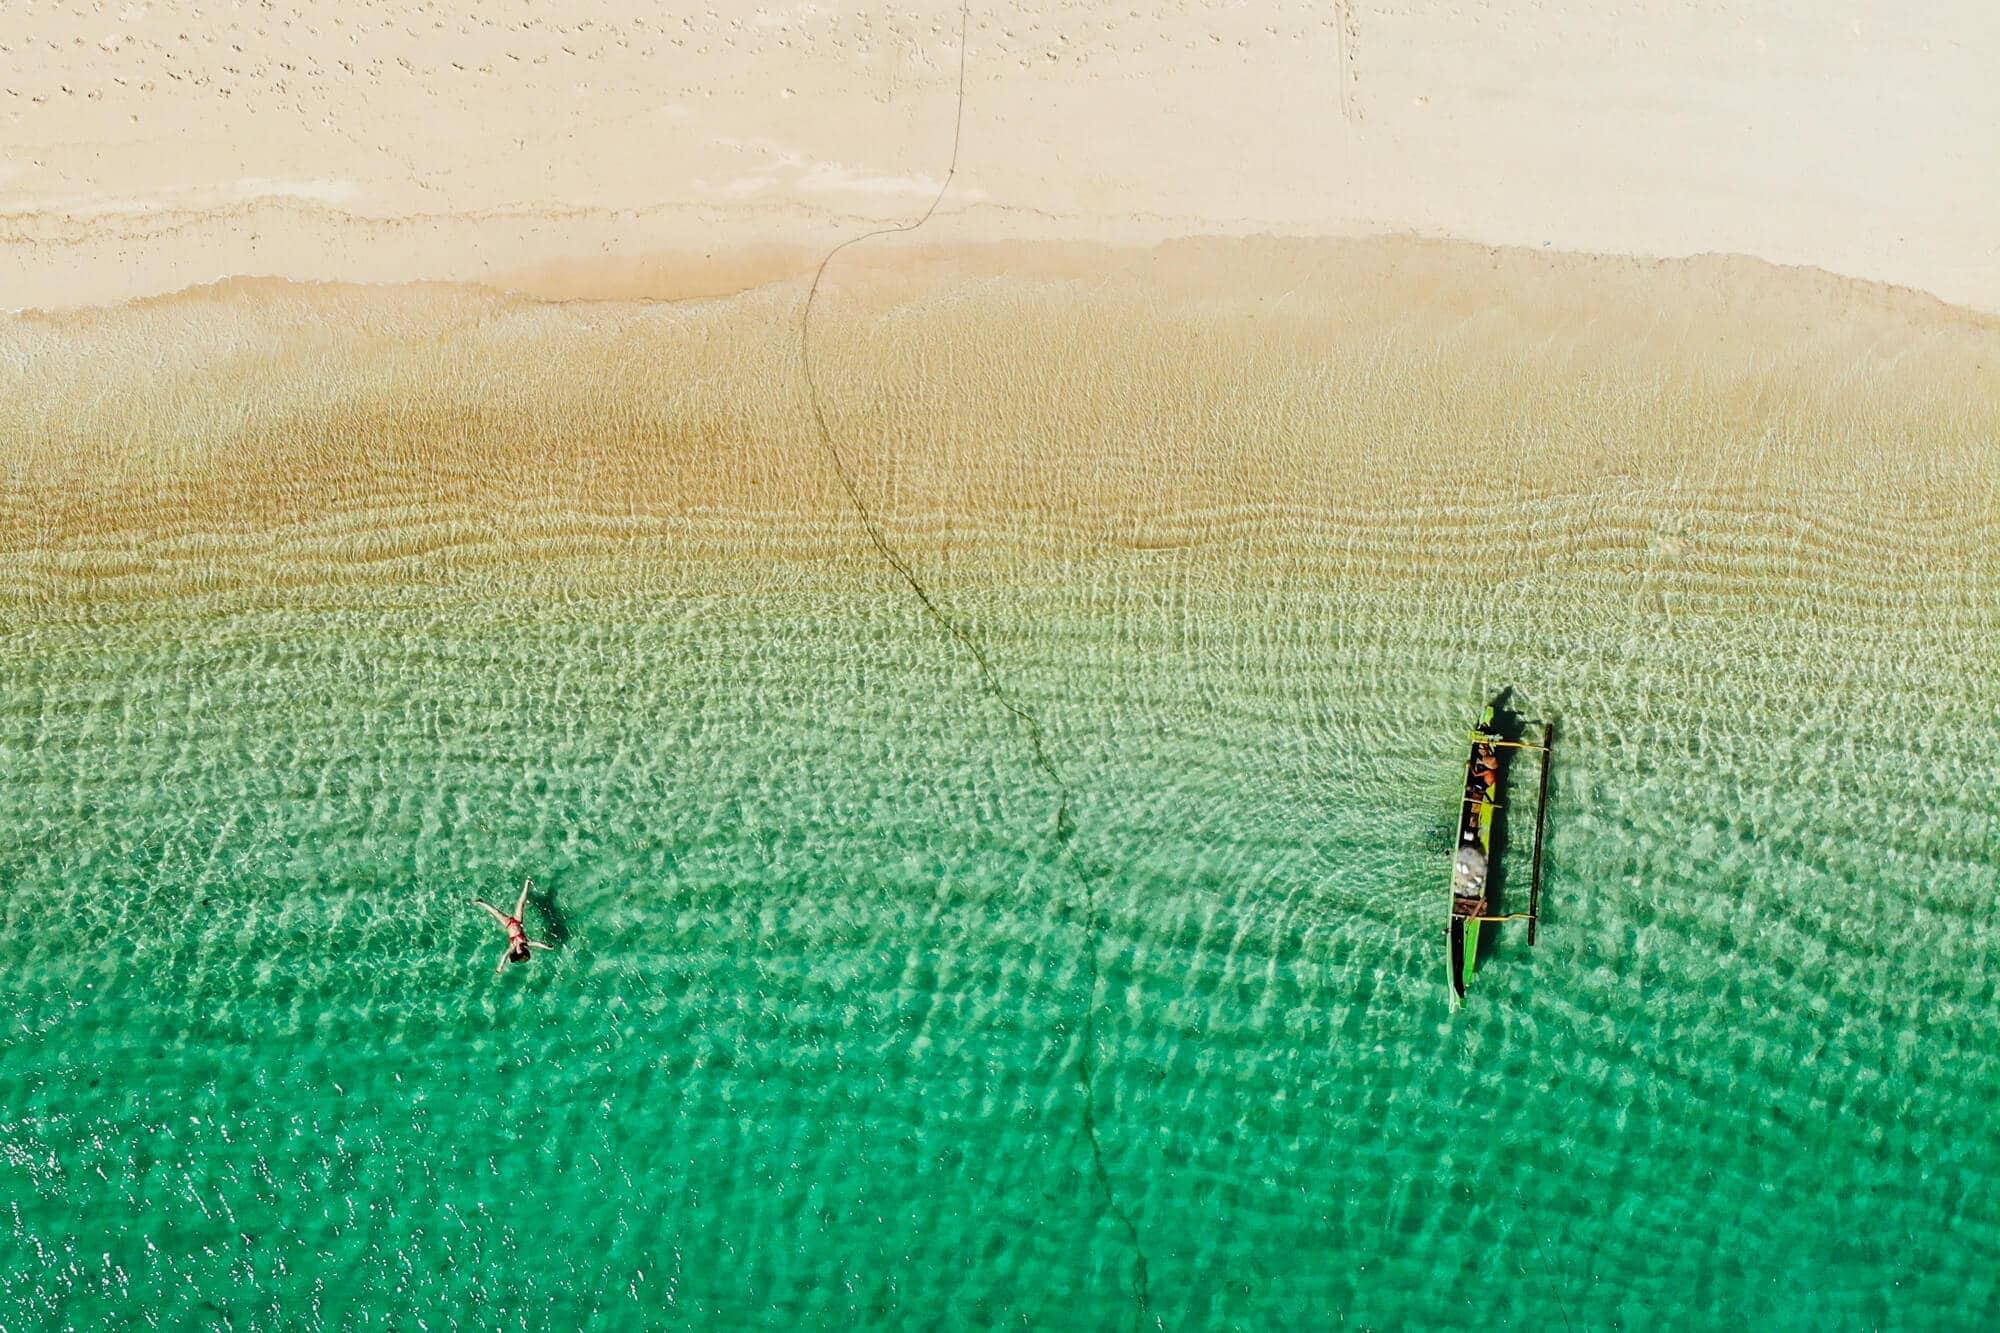 Follow along on our journey living in Kuta, Lombok for two months - Drone shot of Tanjung Aan Beach #lombok #kuta #indonesia #travelinspo #bucketlist